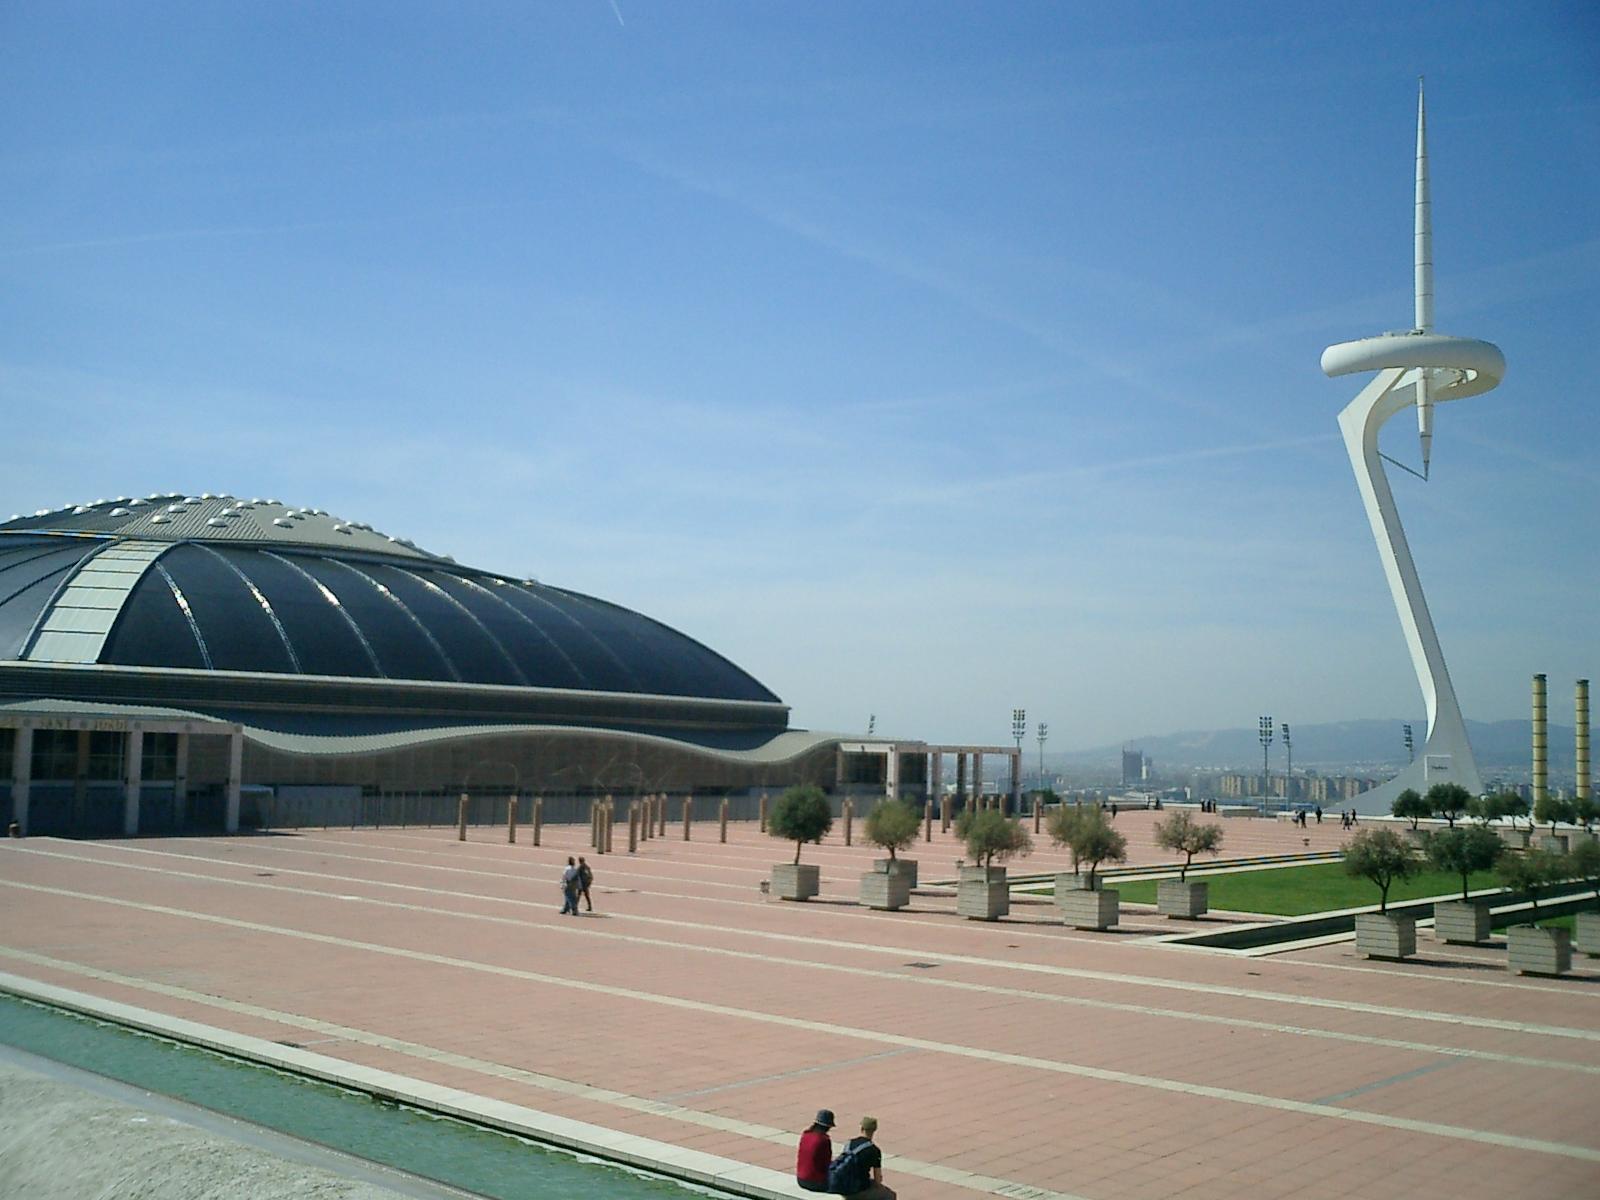 Palau_San_Jordi_Torre_Calatrava_Barcelona.jpg